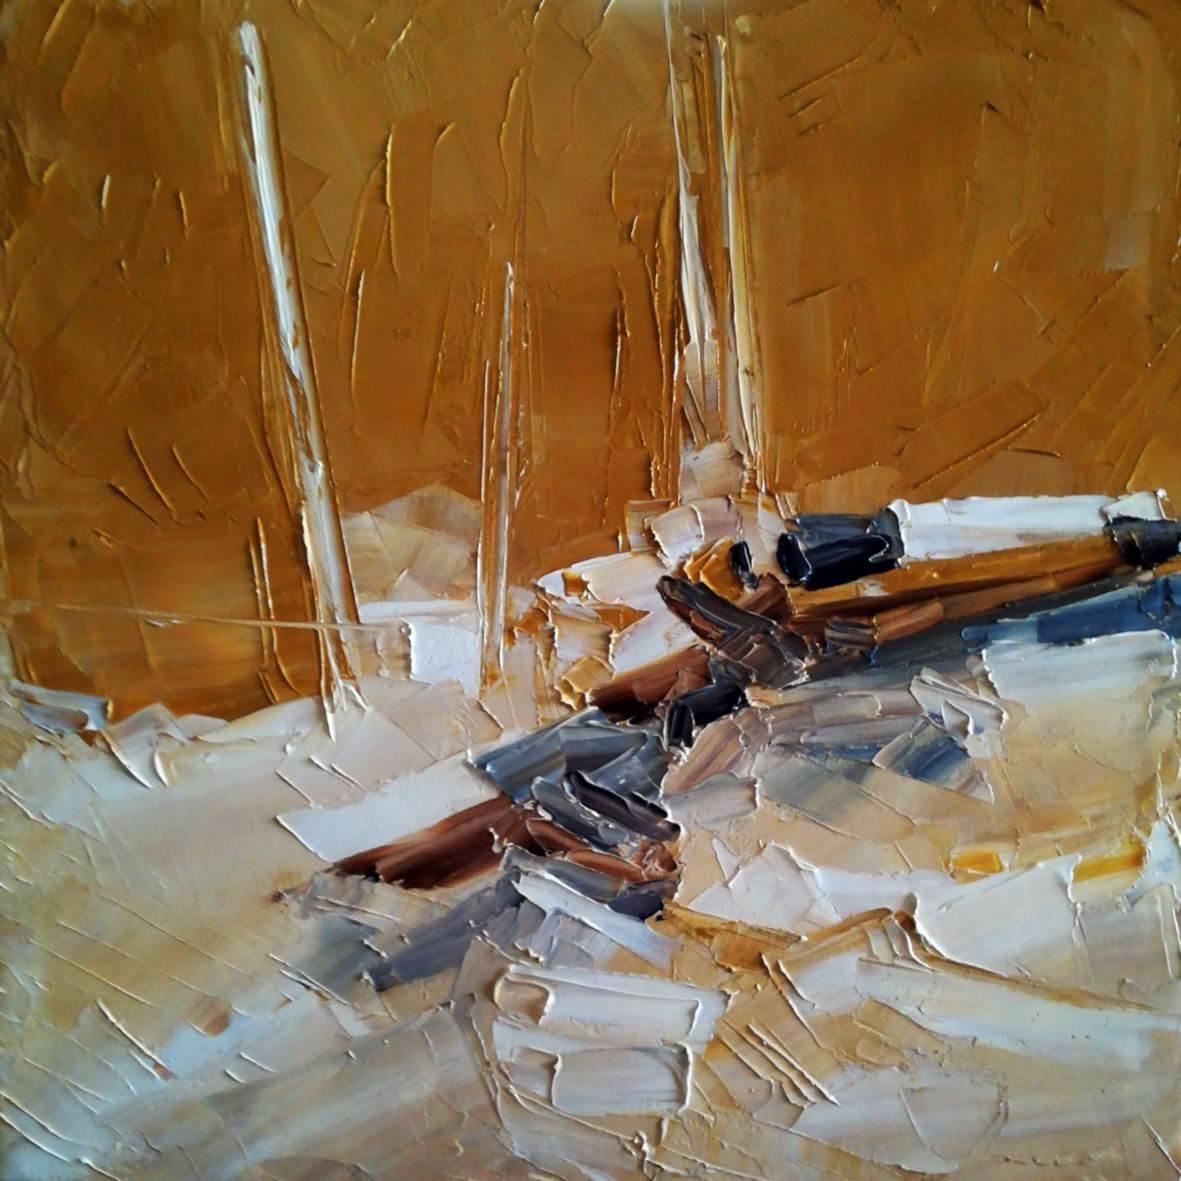 """ Velero "". Cabo de Gata. óleo espátula lienzo.  31.5 x 31.5 cm. http://bohemiogus.blogspot.com http://www.facebook.com/atomista"